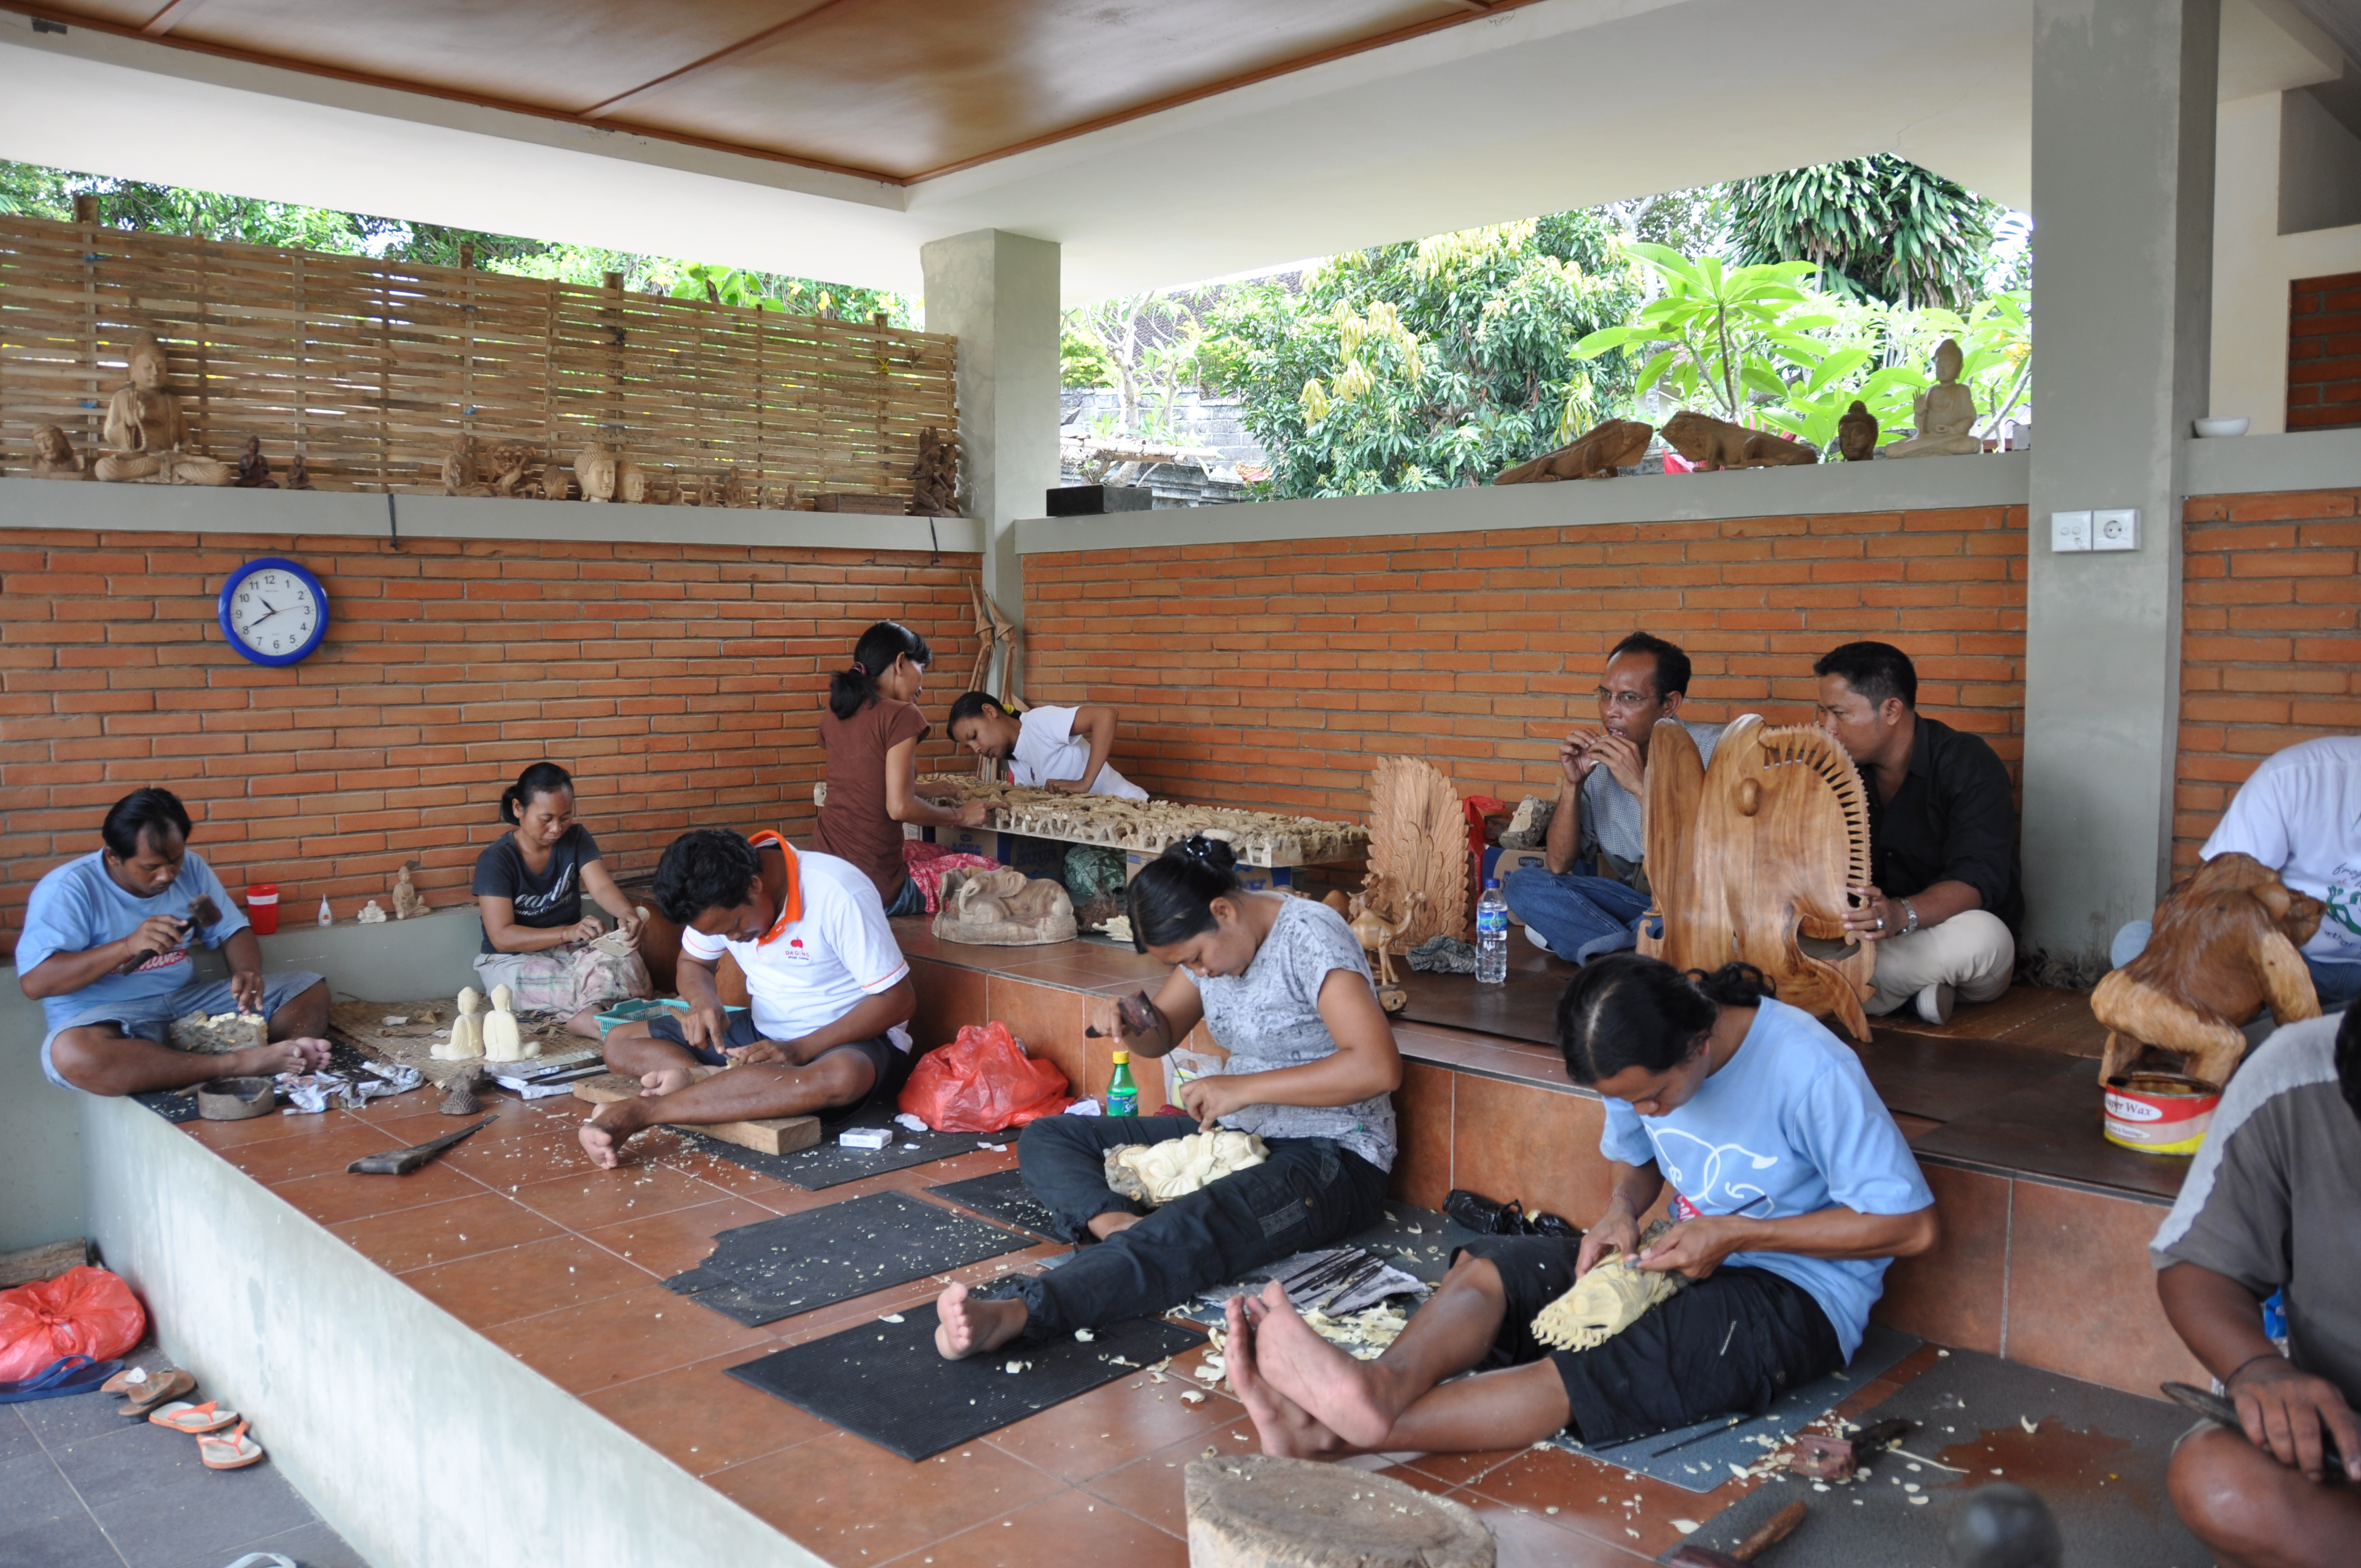 File:Wood carving in Bali jpg - Wikimedia Commons